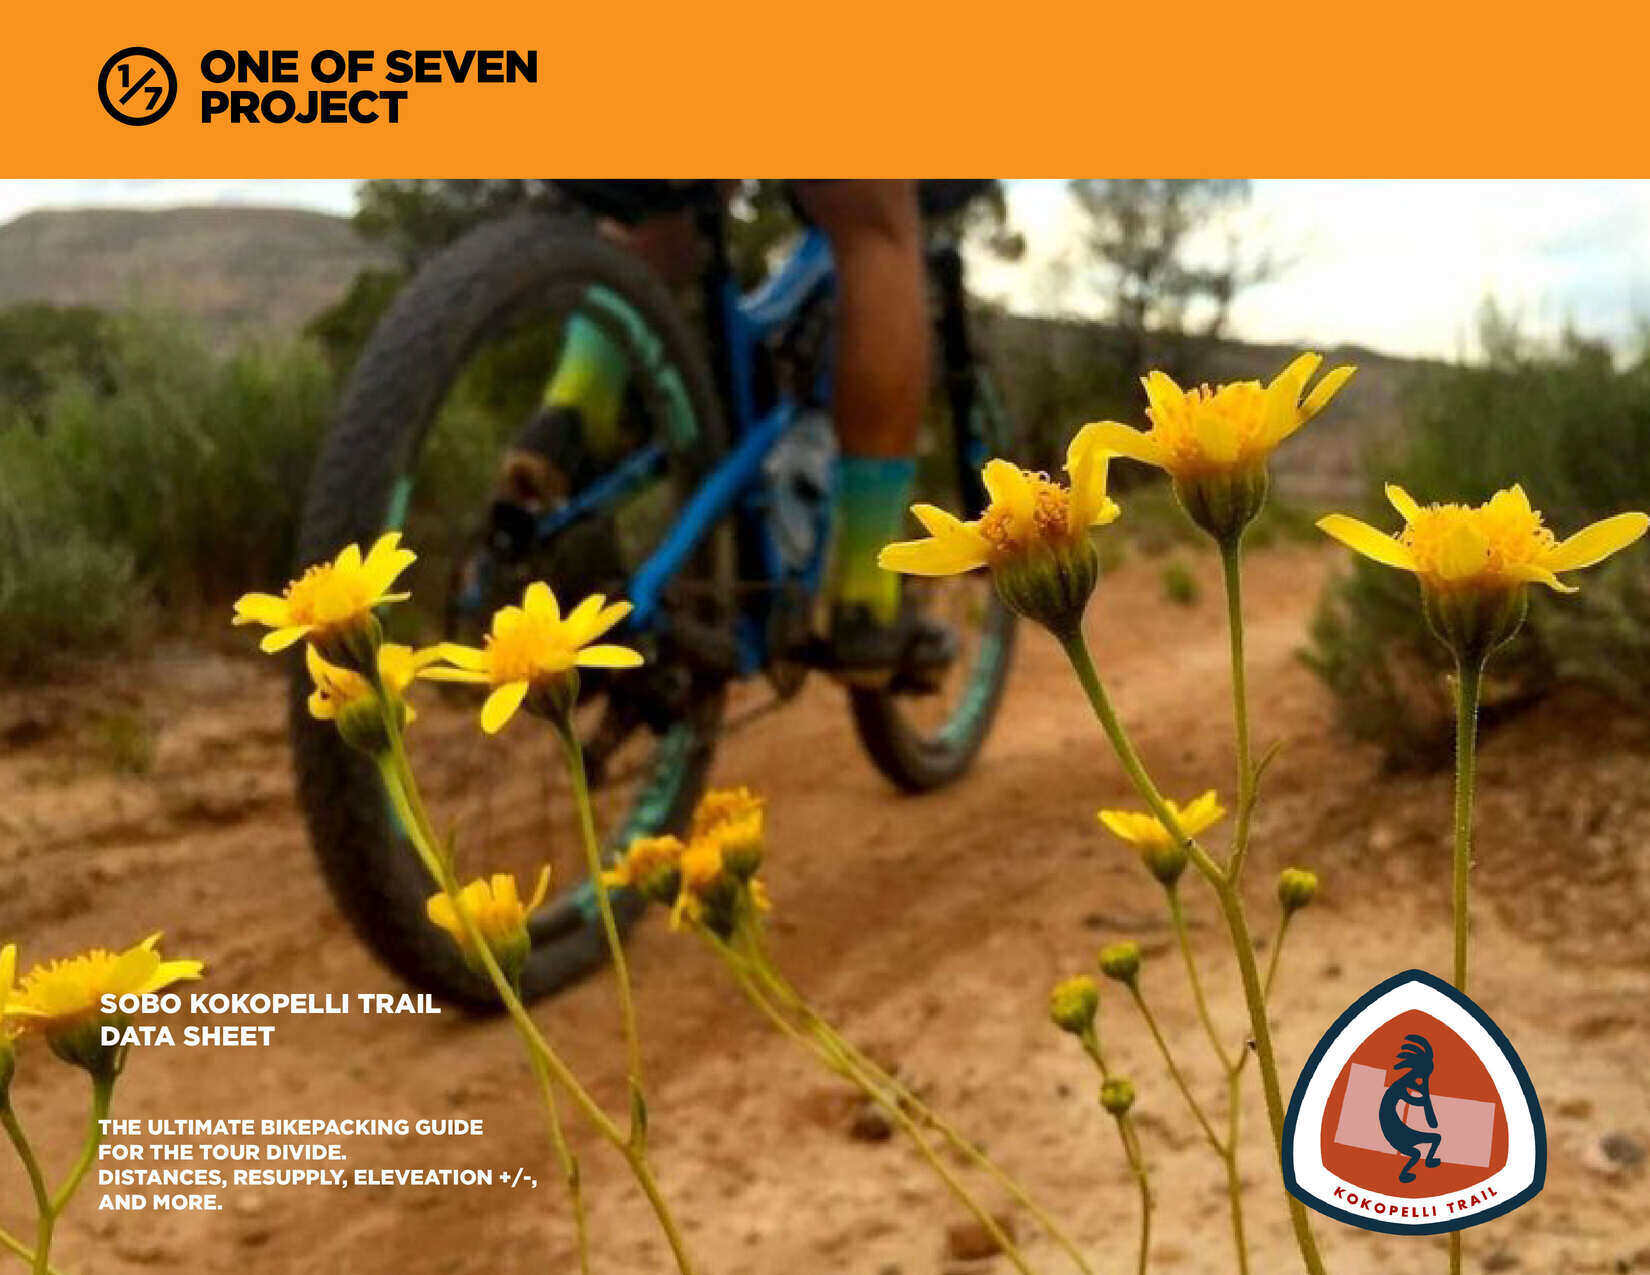 Kokopelli Trail SOBO Planning Aid Cover bikepacking guide